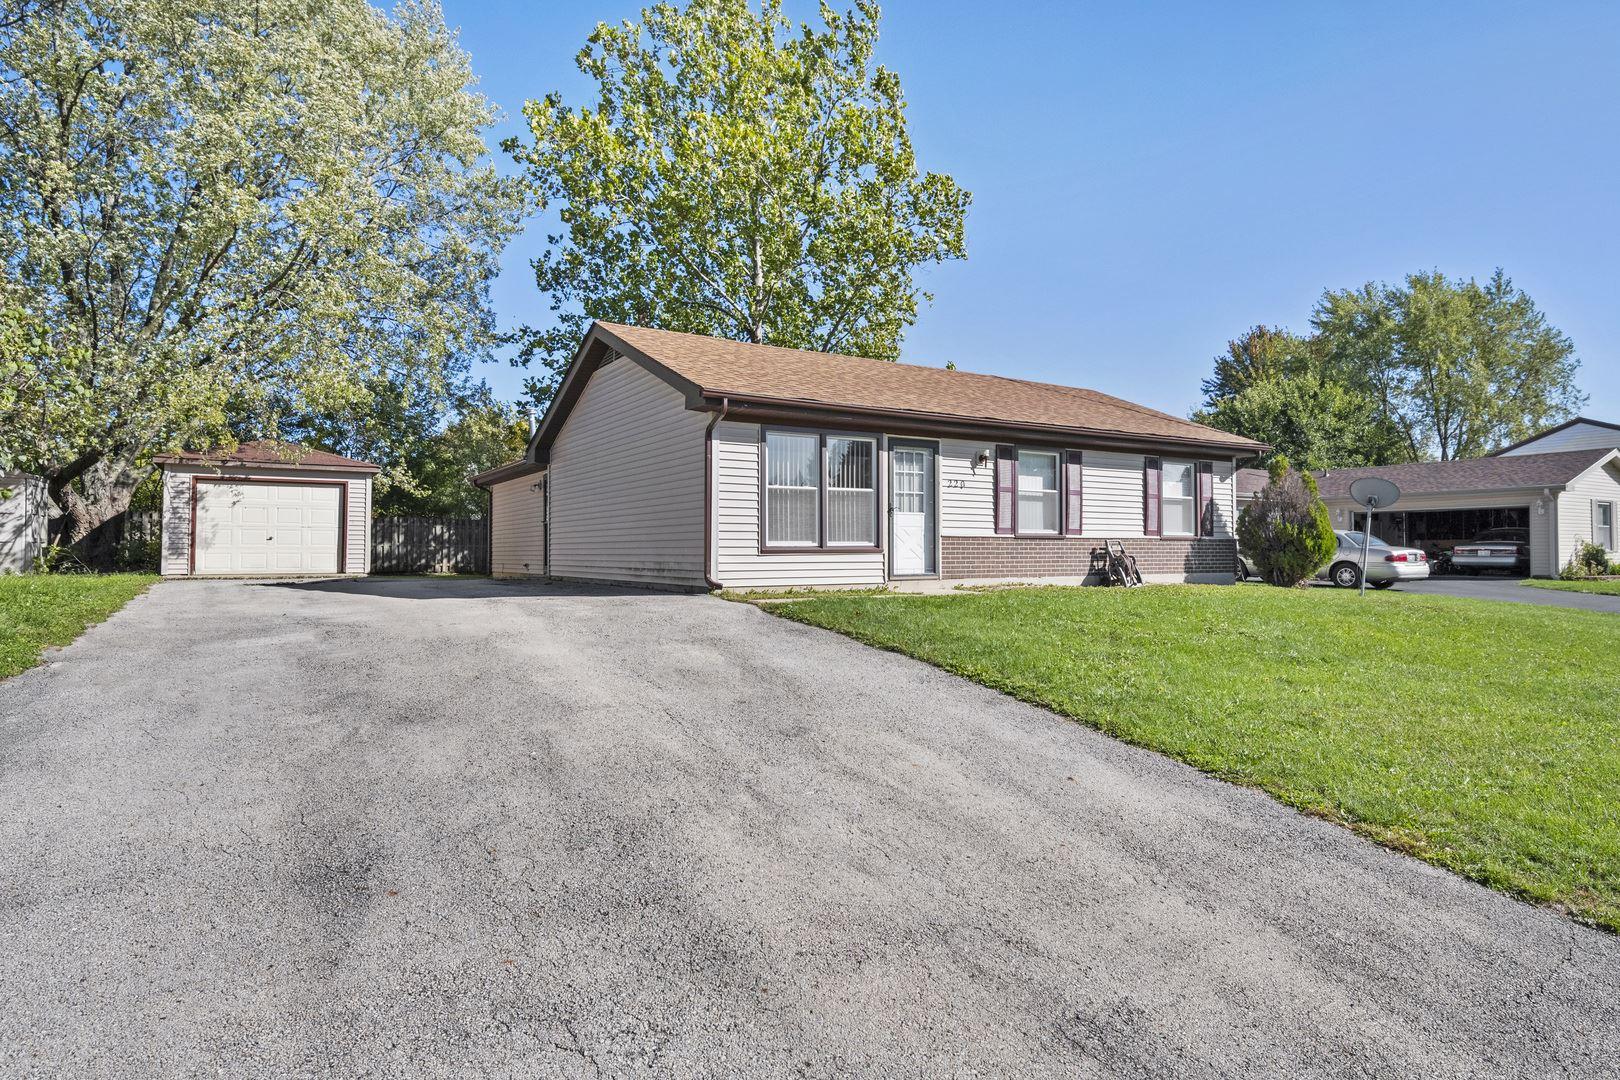 Photo of 220 Lexington Drive, Bolingbrook, IL 60440 (MLS # 10895082)